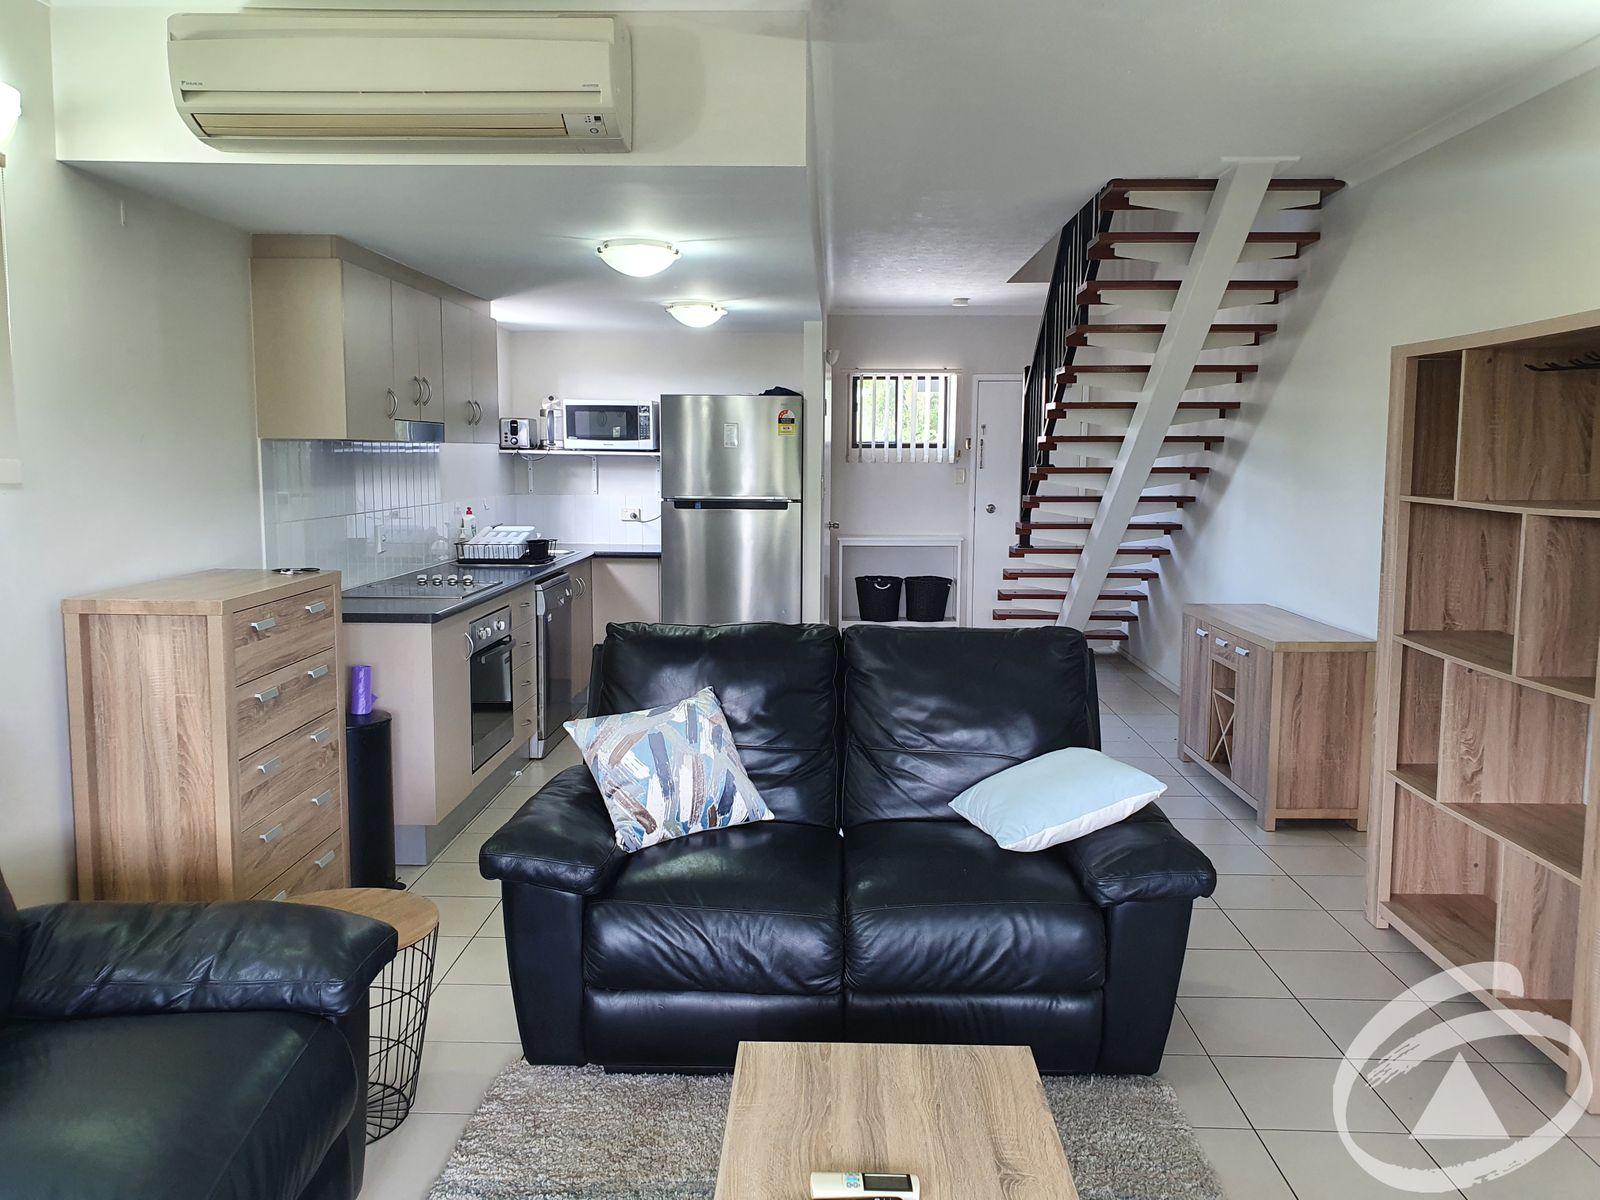 29/82 Martyn Street, Parramatta Park, QLD 4870